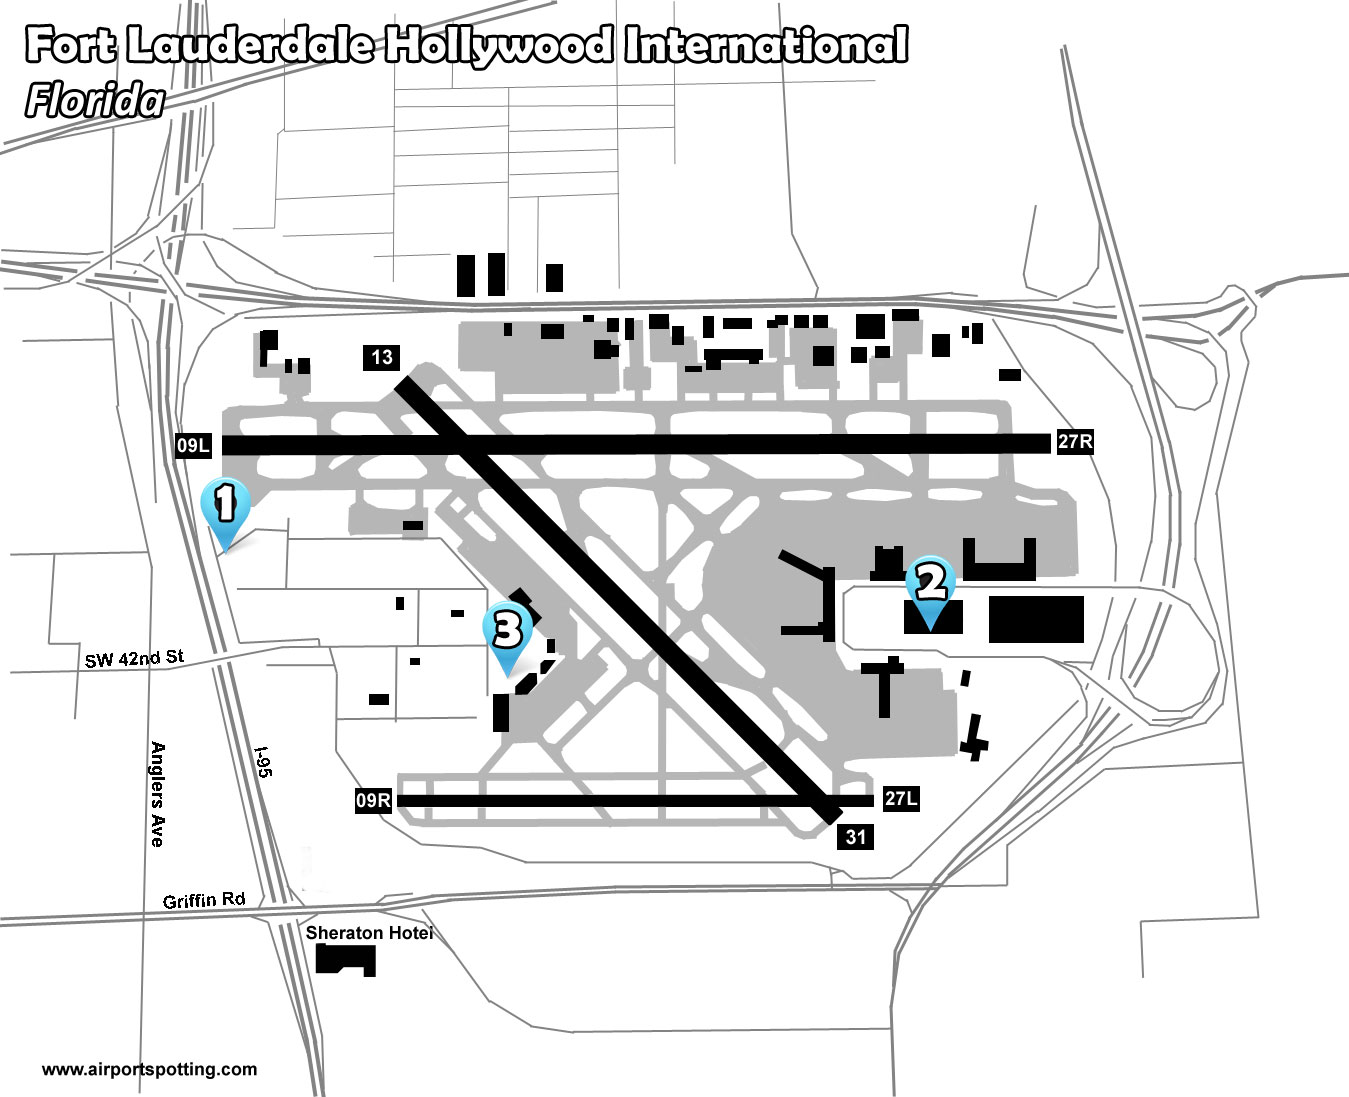 fort lauderdale - airport spotting